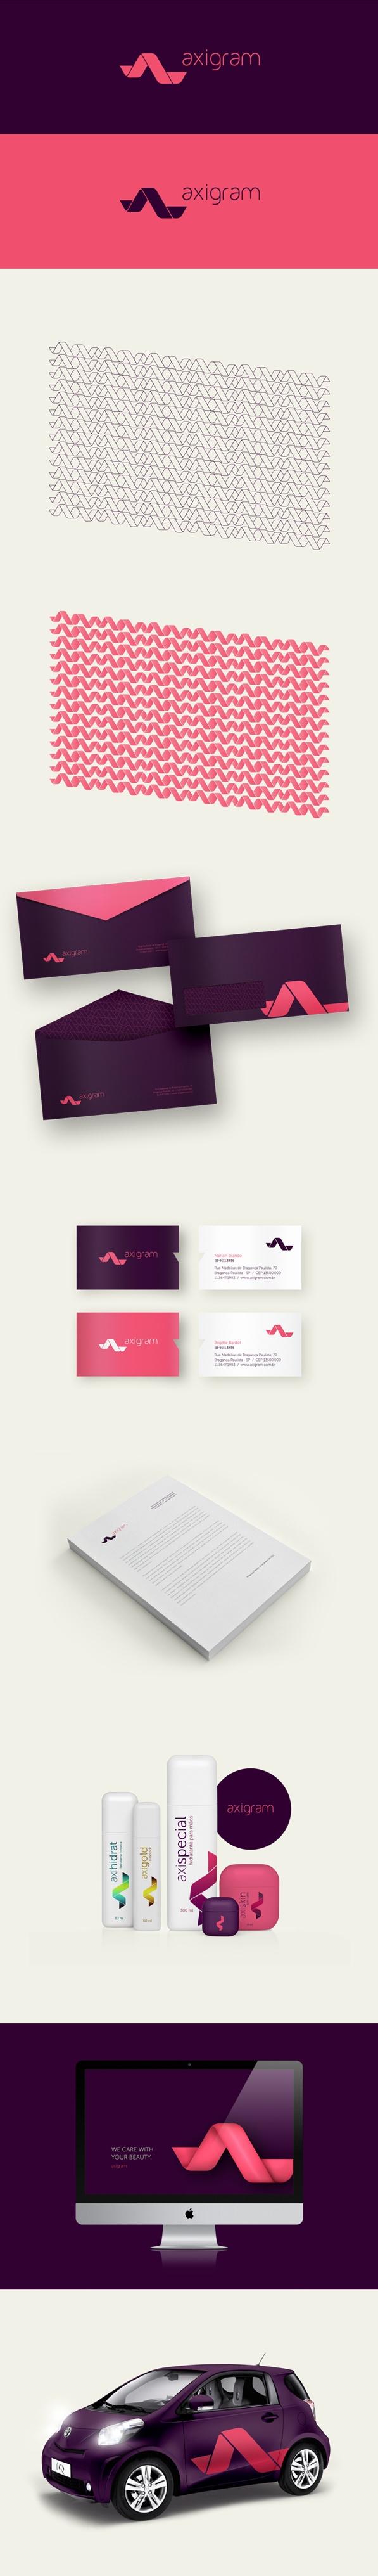 Axigram Branding by Douglas Marchiori, via Behance | #stationary #corporate #design #corporatedesign #identity #branding #marketing < repinned by www.BlickeDeeler.de | Take a look at www.LogoGestaltung-Hamburg.de